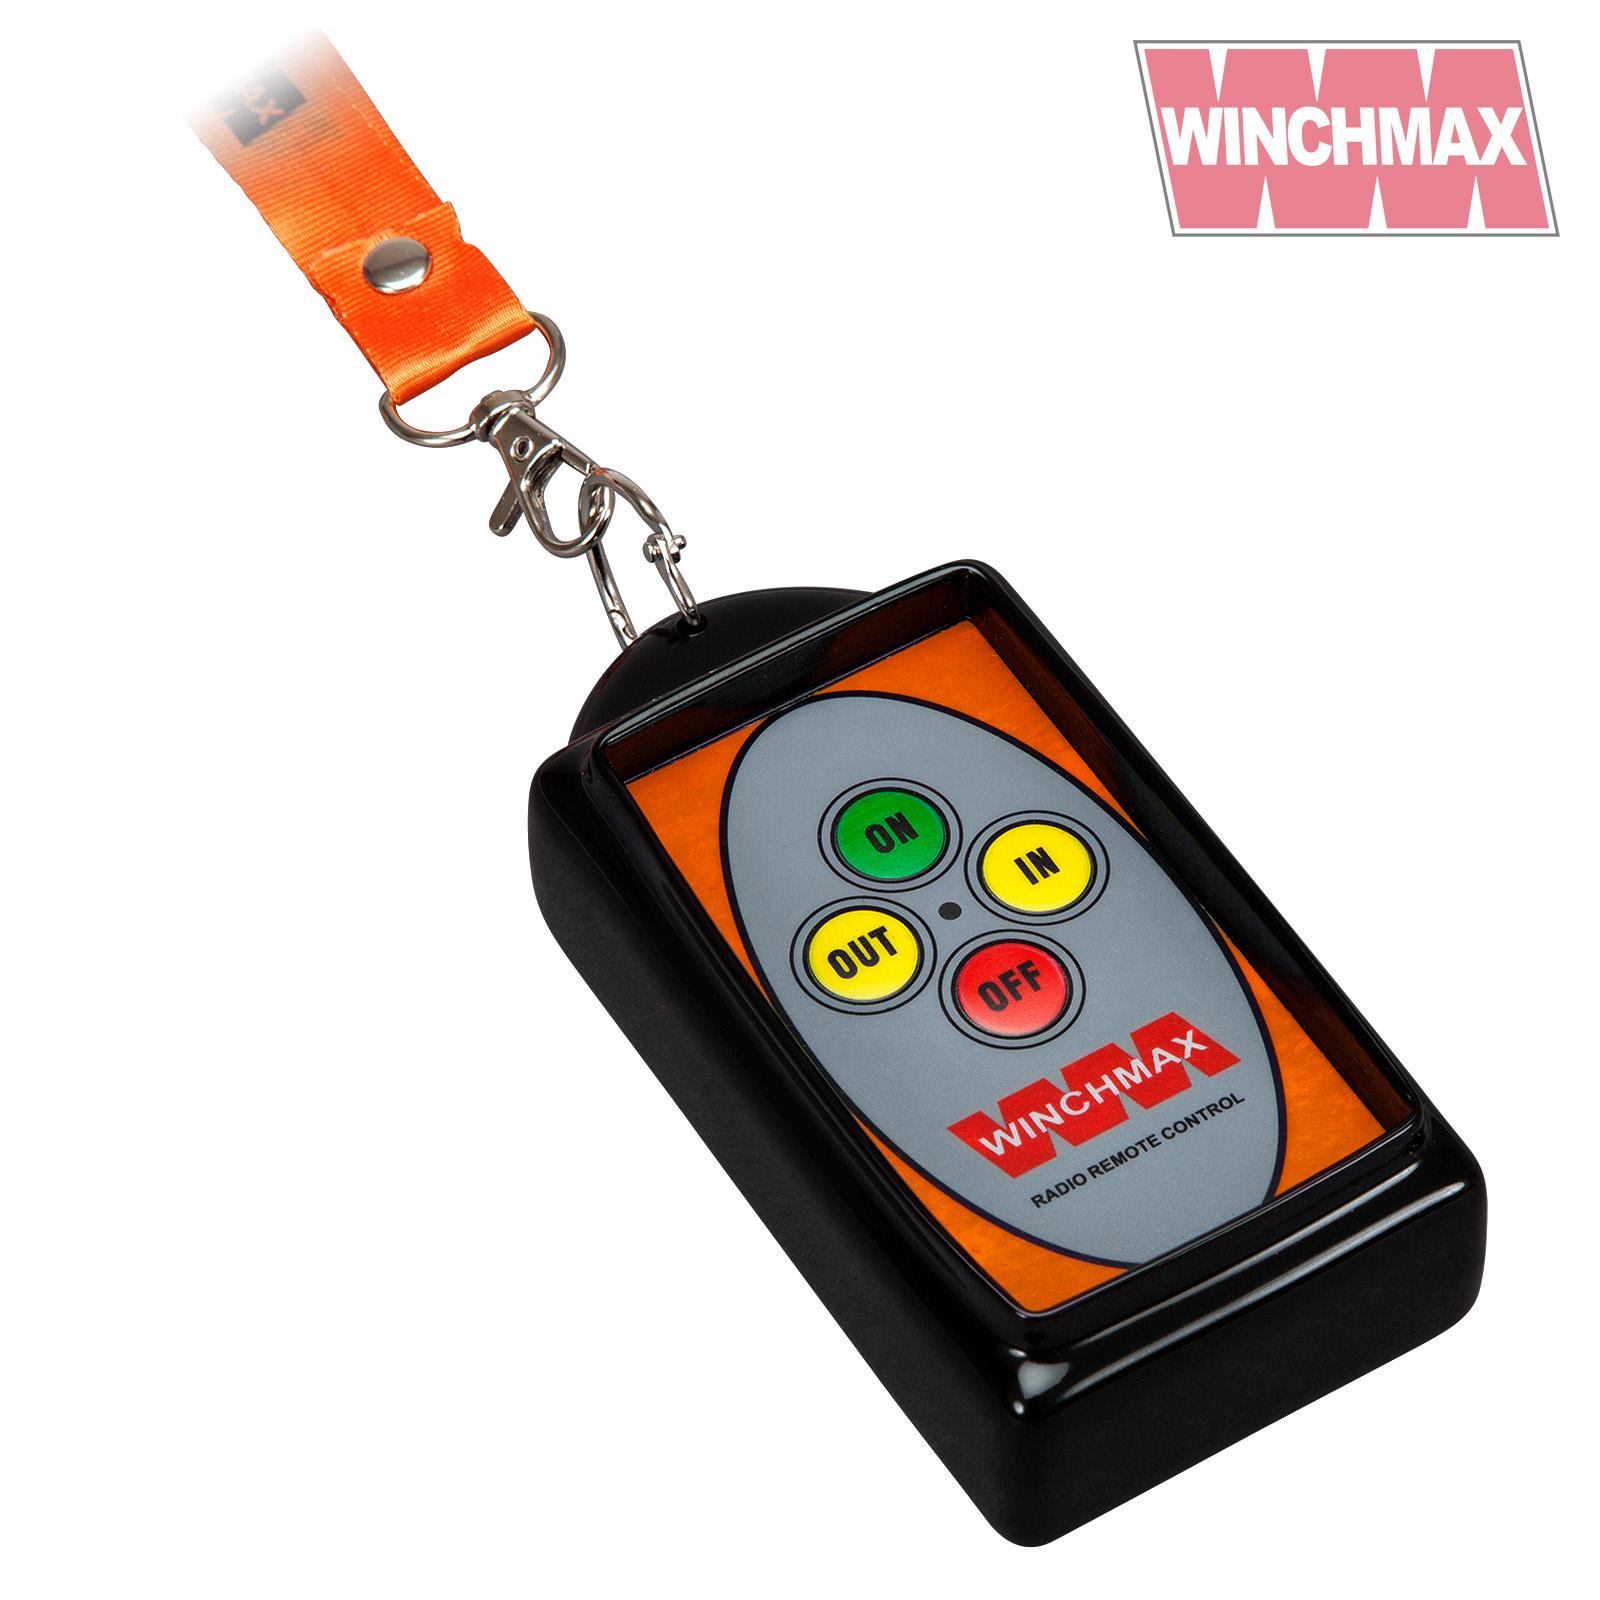 Wmhdremkit2 winchmax 427